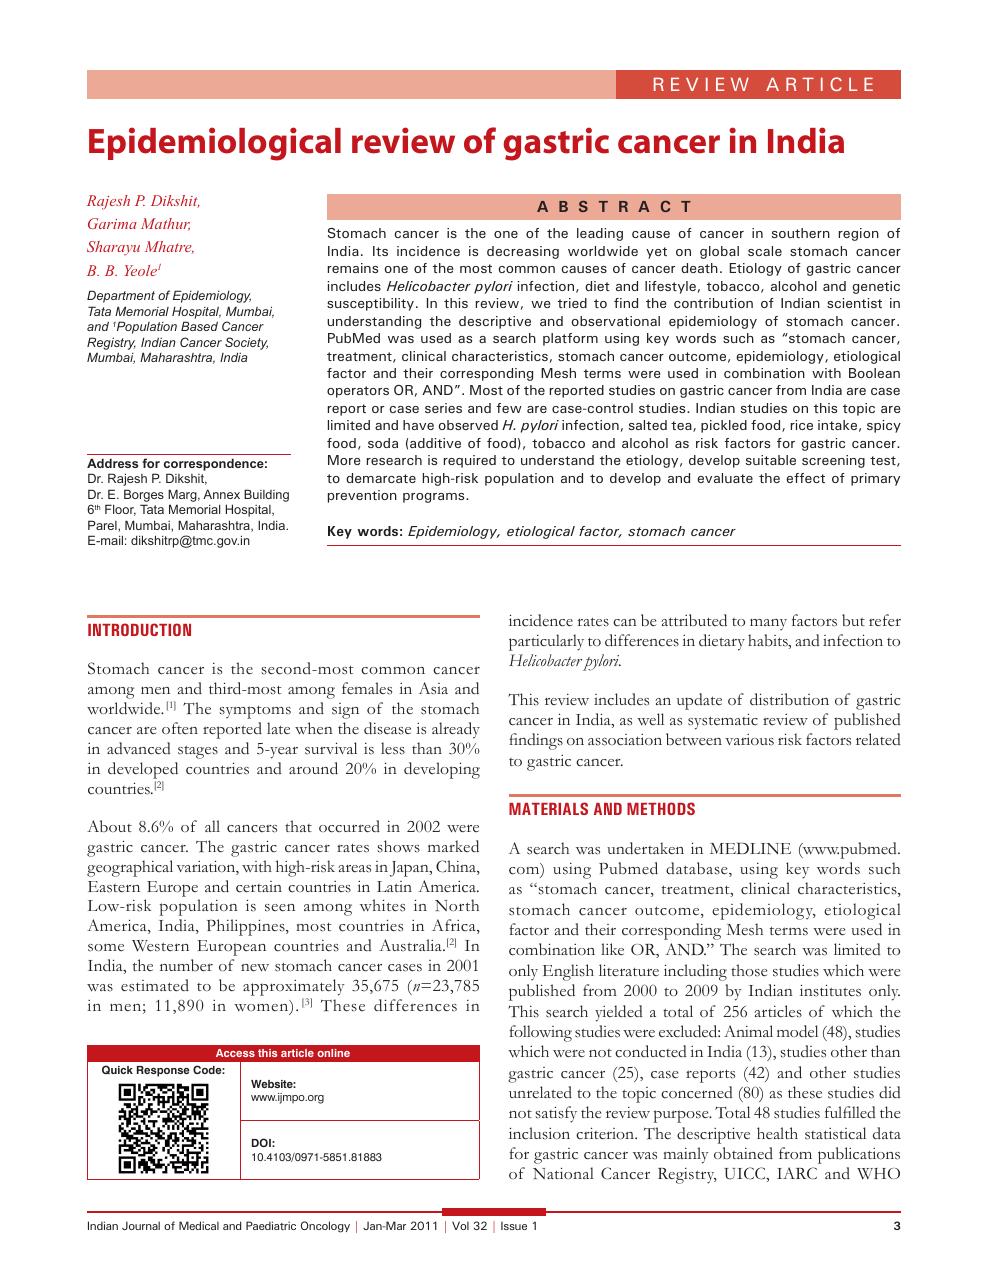 Florin Zaharie - Google Scholar Citations